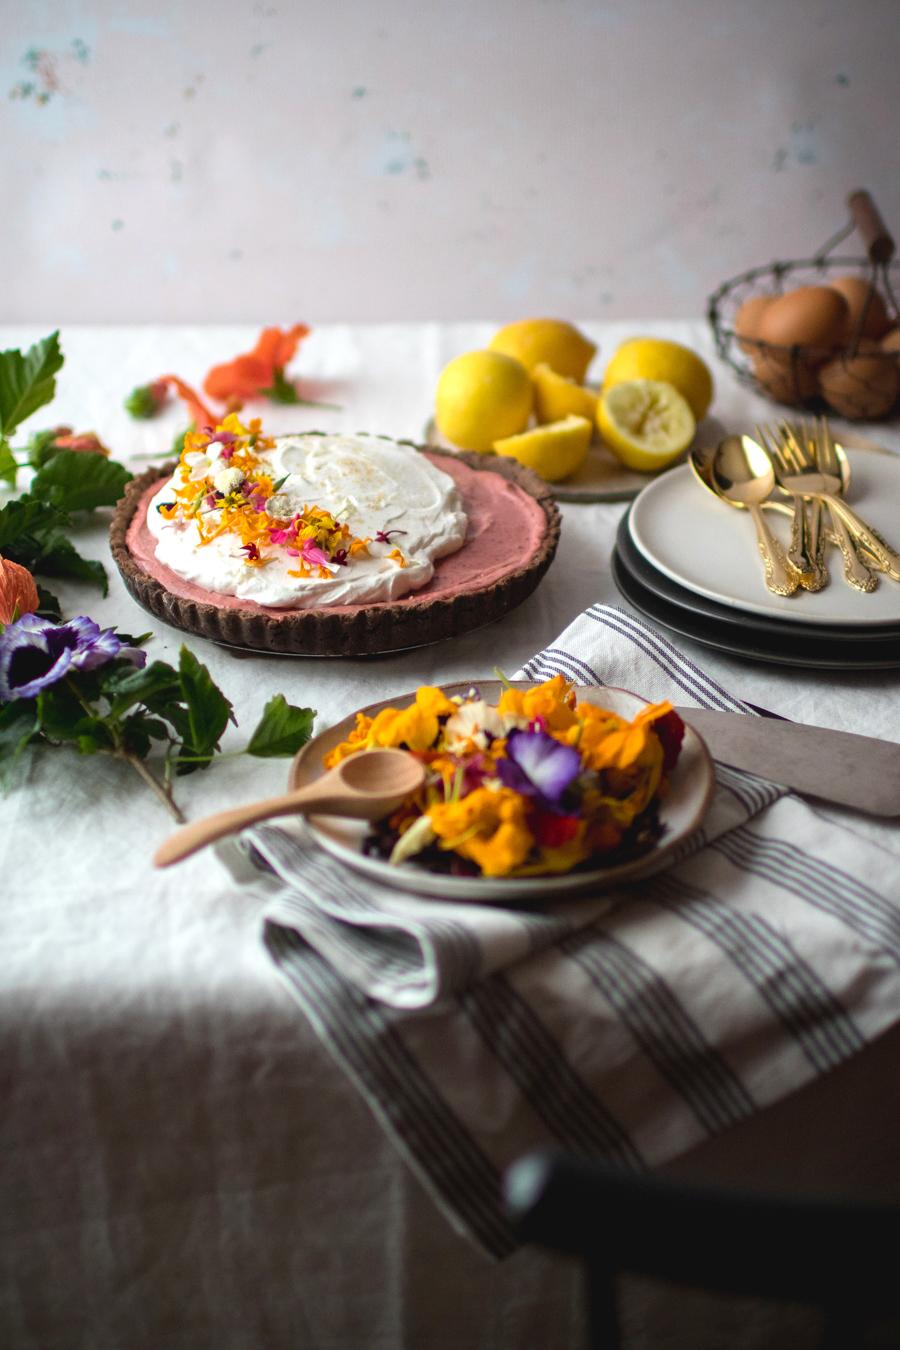 hibiscus lemon curd tart with edible flowers